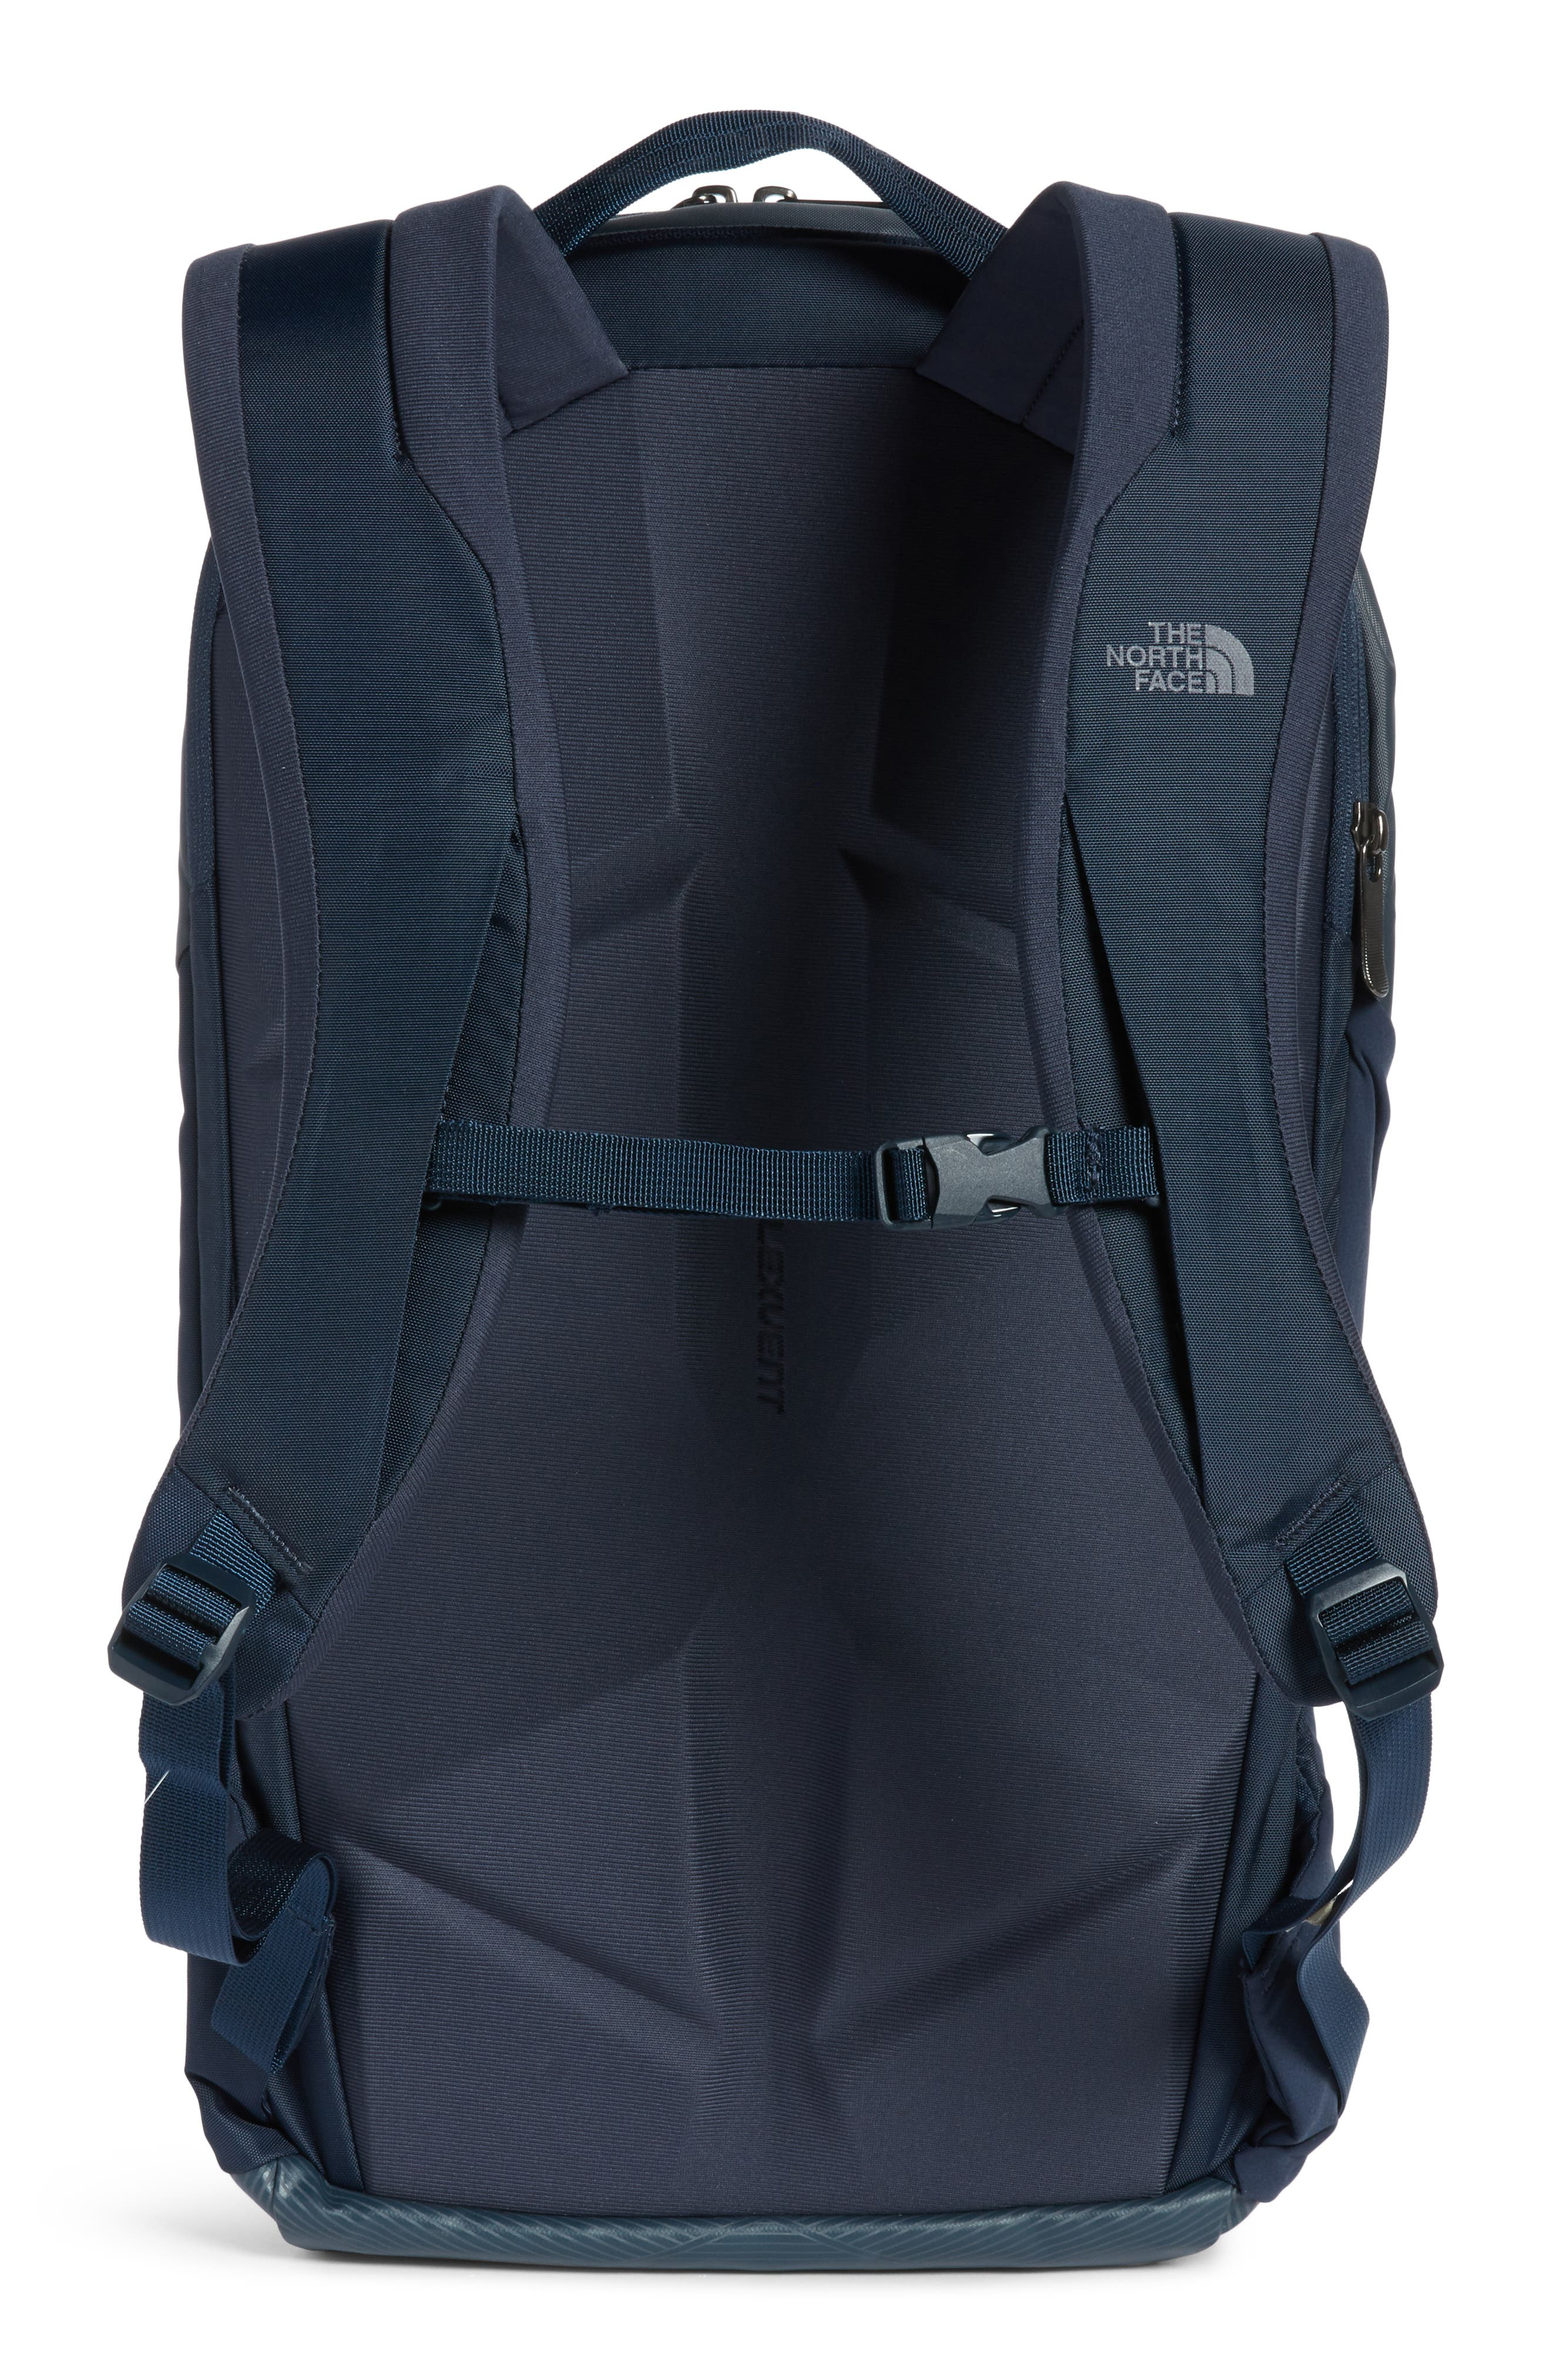 Kabyte Backpack,                             Alternate thumbnail 3, color,                             VANADIS GREY/ URBAN NAVY